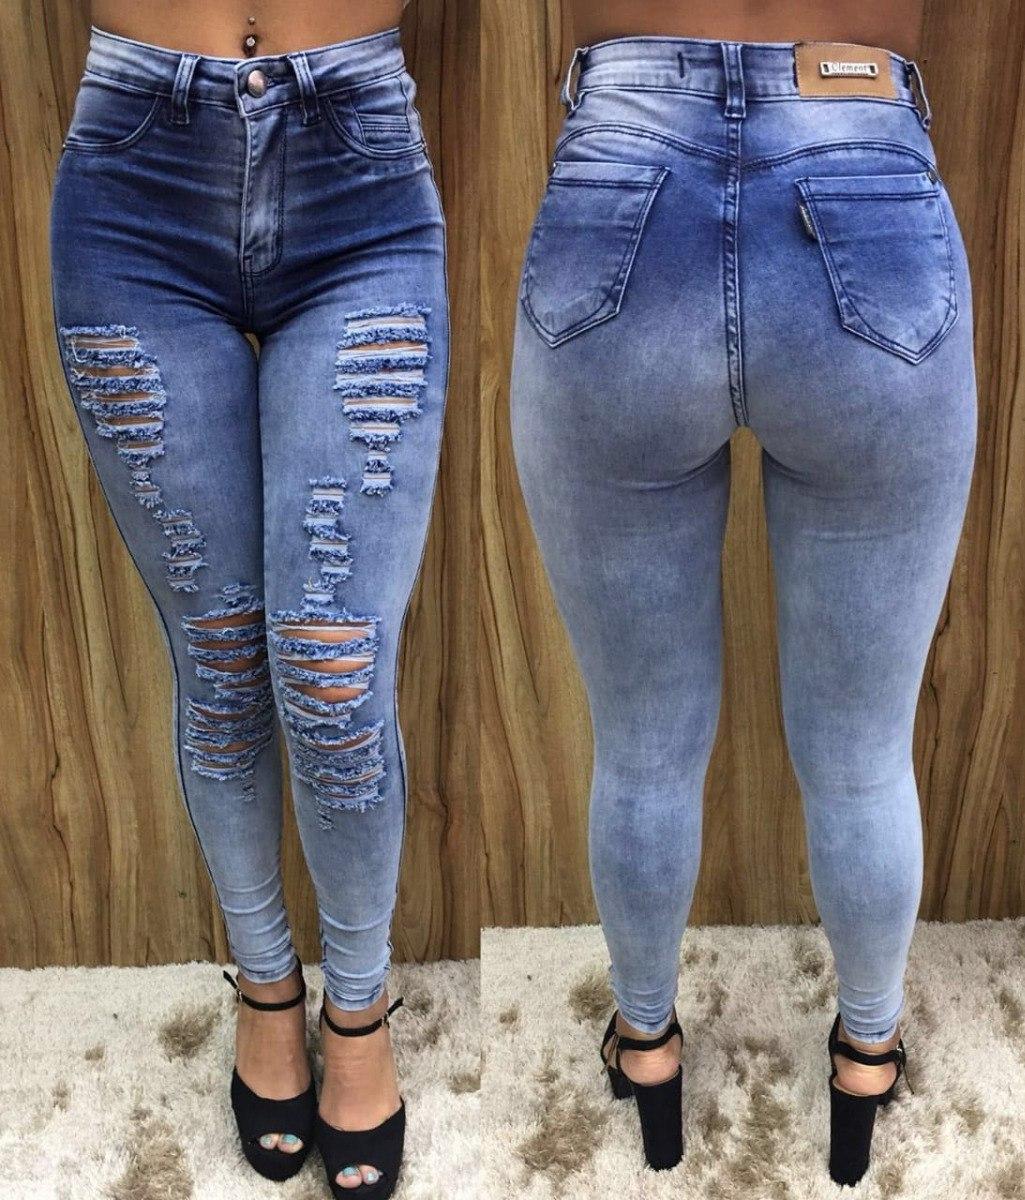 8daabb043 calça jeans feminina cintura alta rasgada destroyed original. Carregando  zoom.